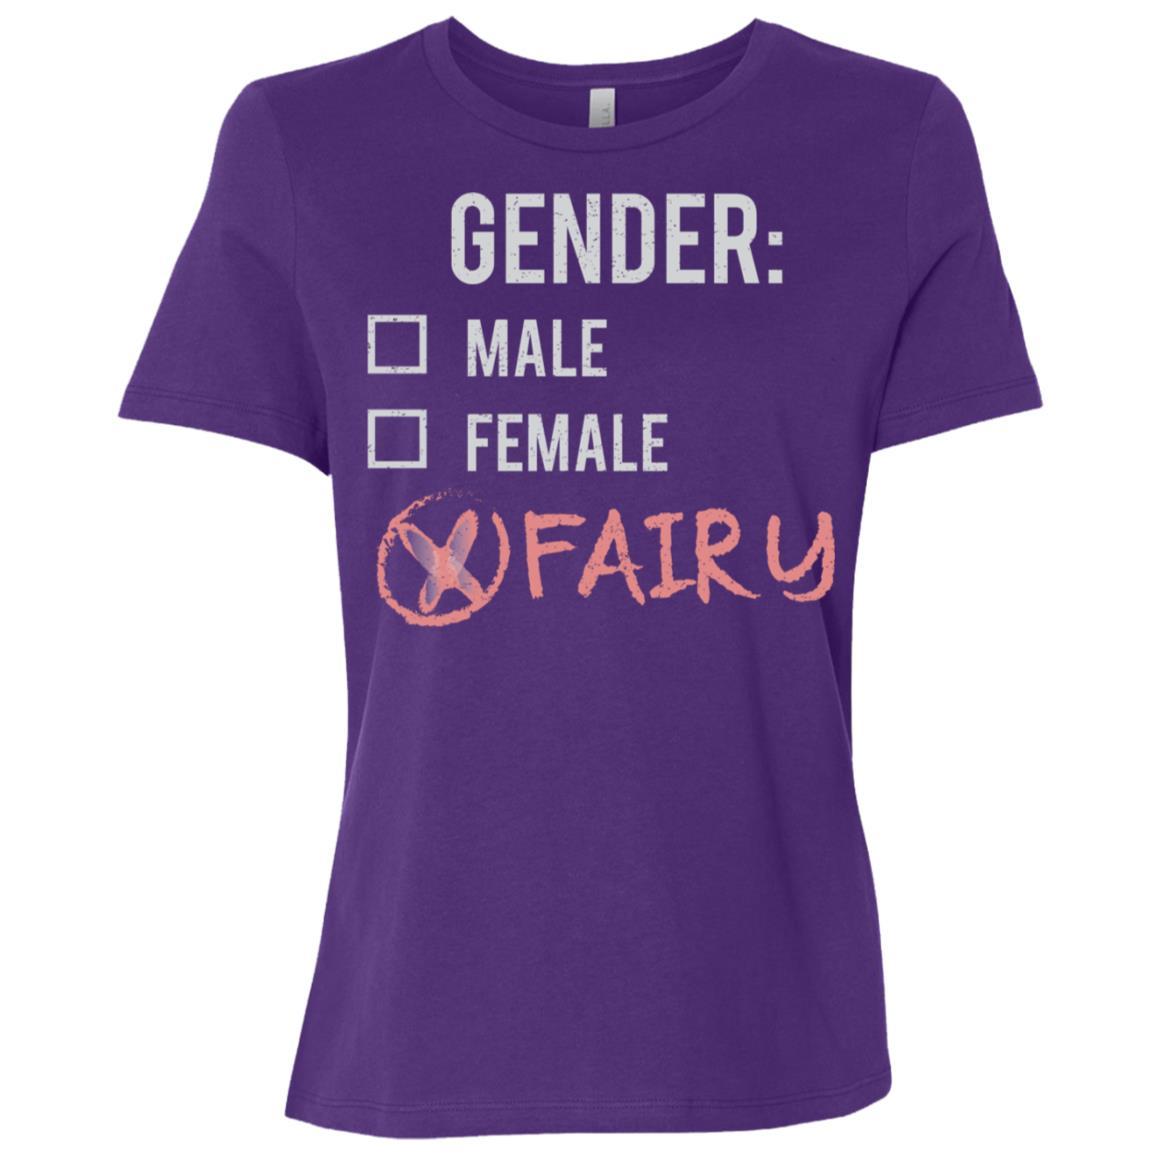 Male Female Fairy Gender Nonbinary Trans Women Short Sleeve T-Shirt